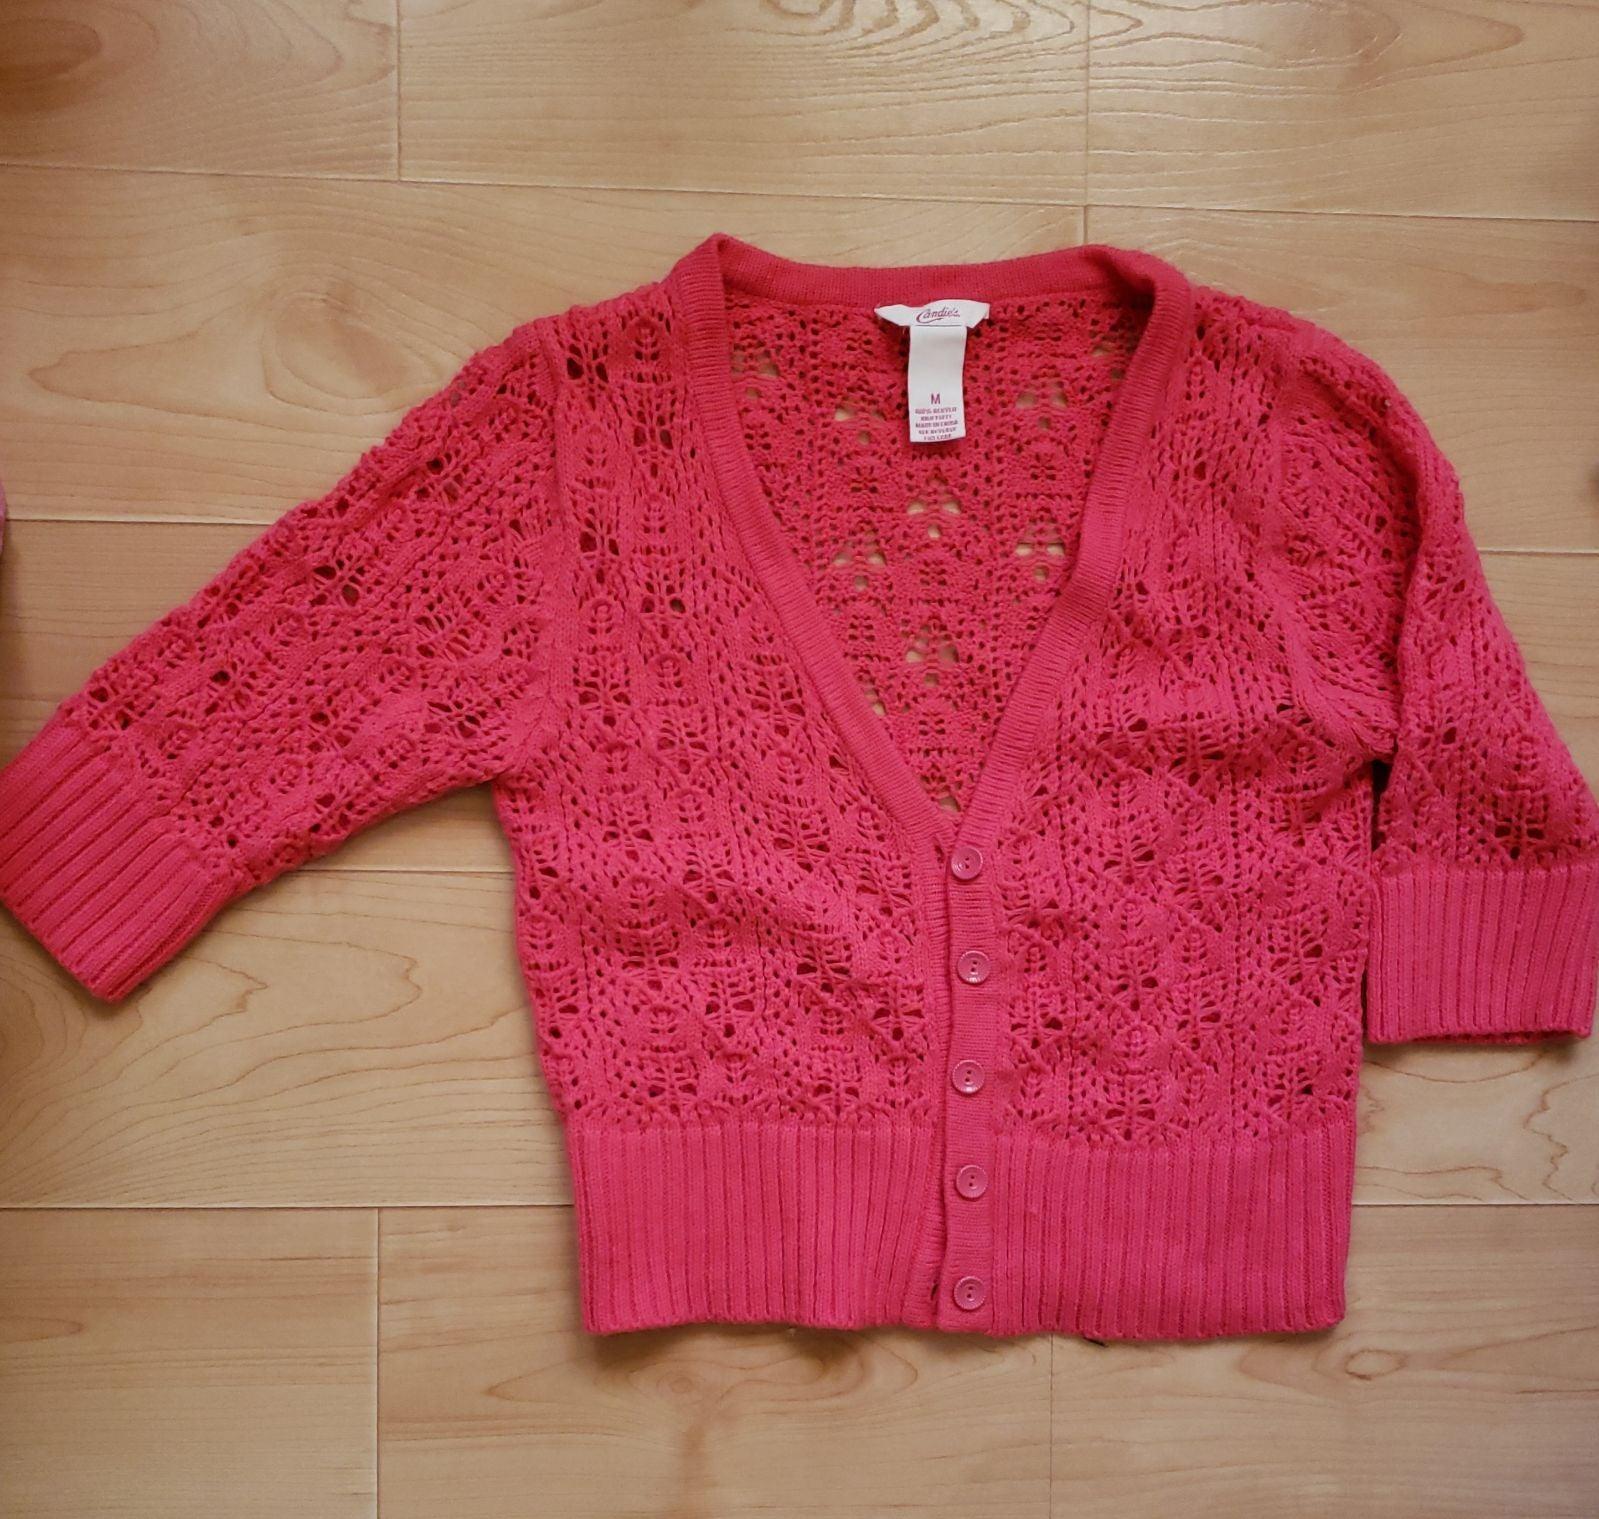 Cardigan pink crochet